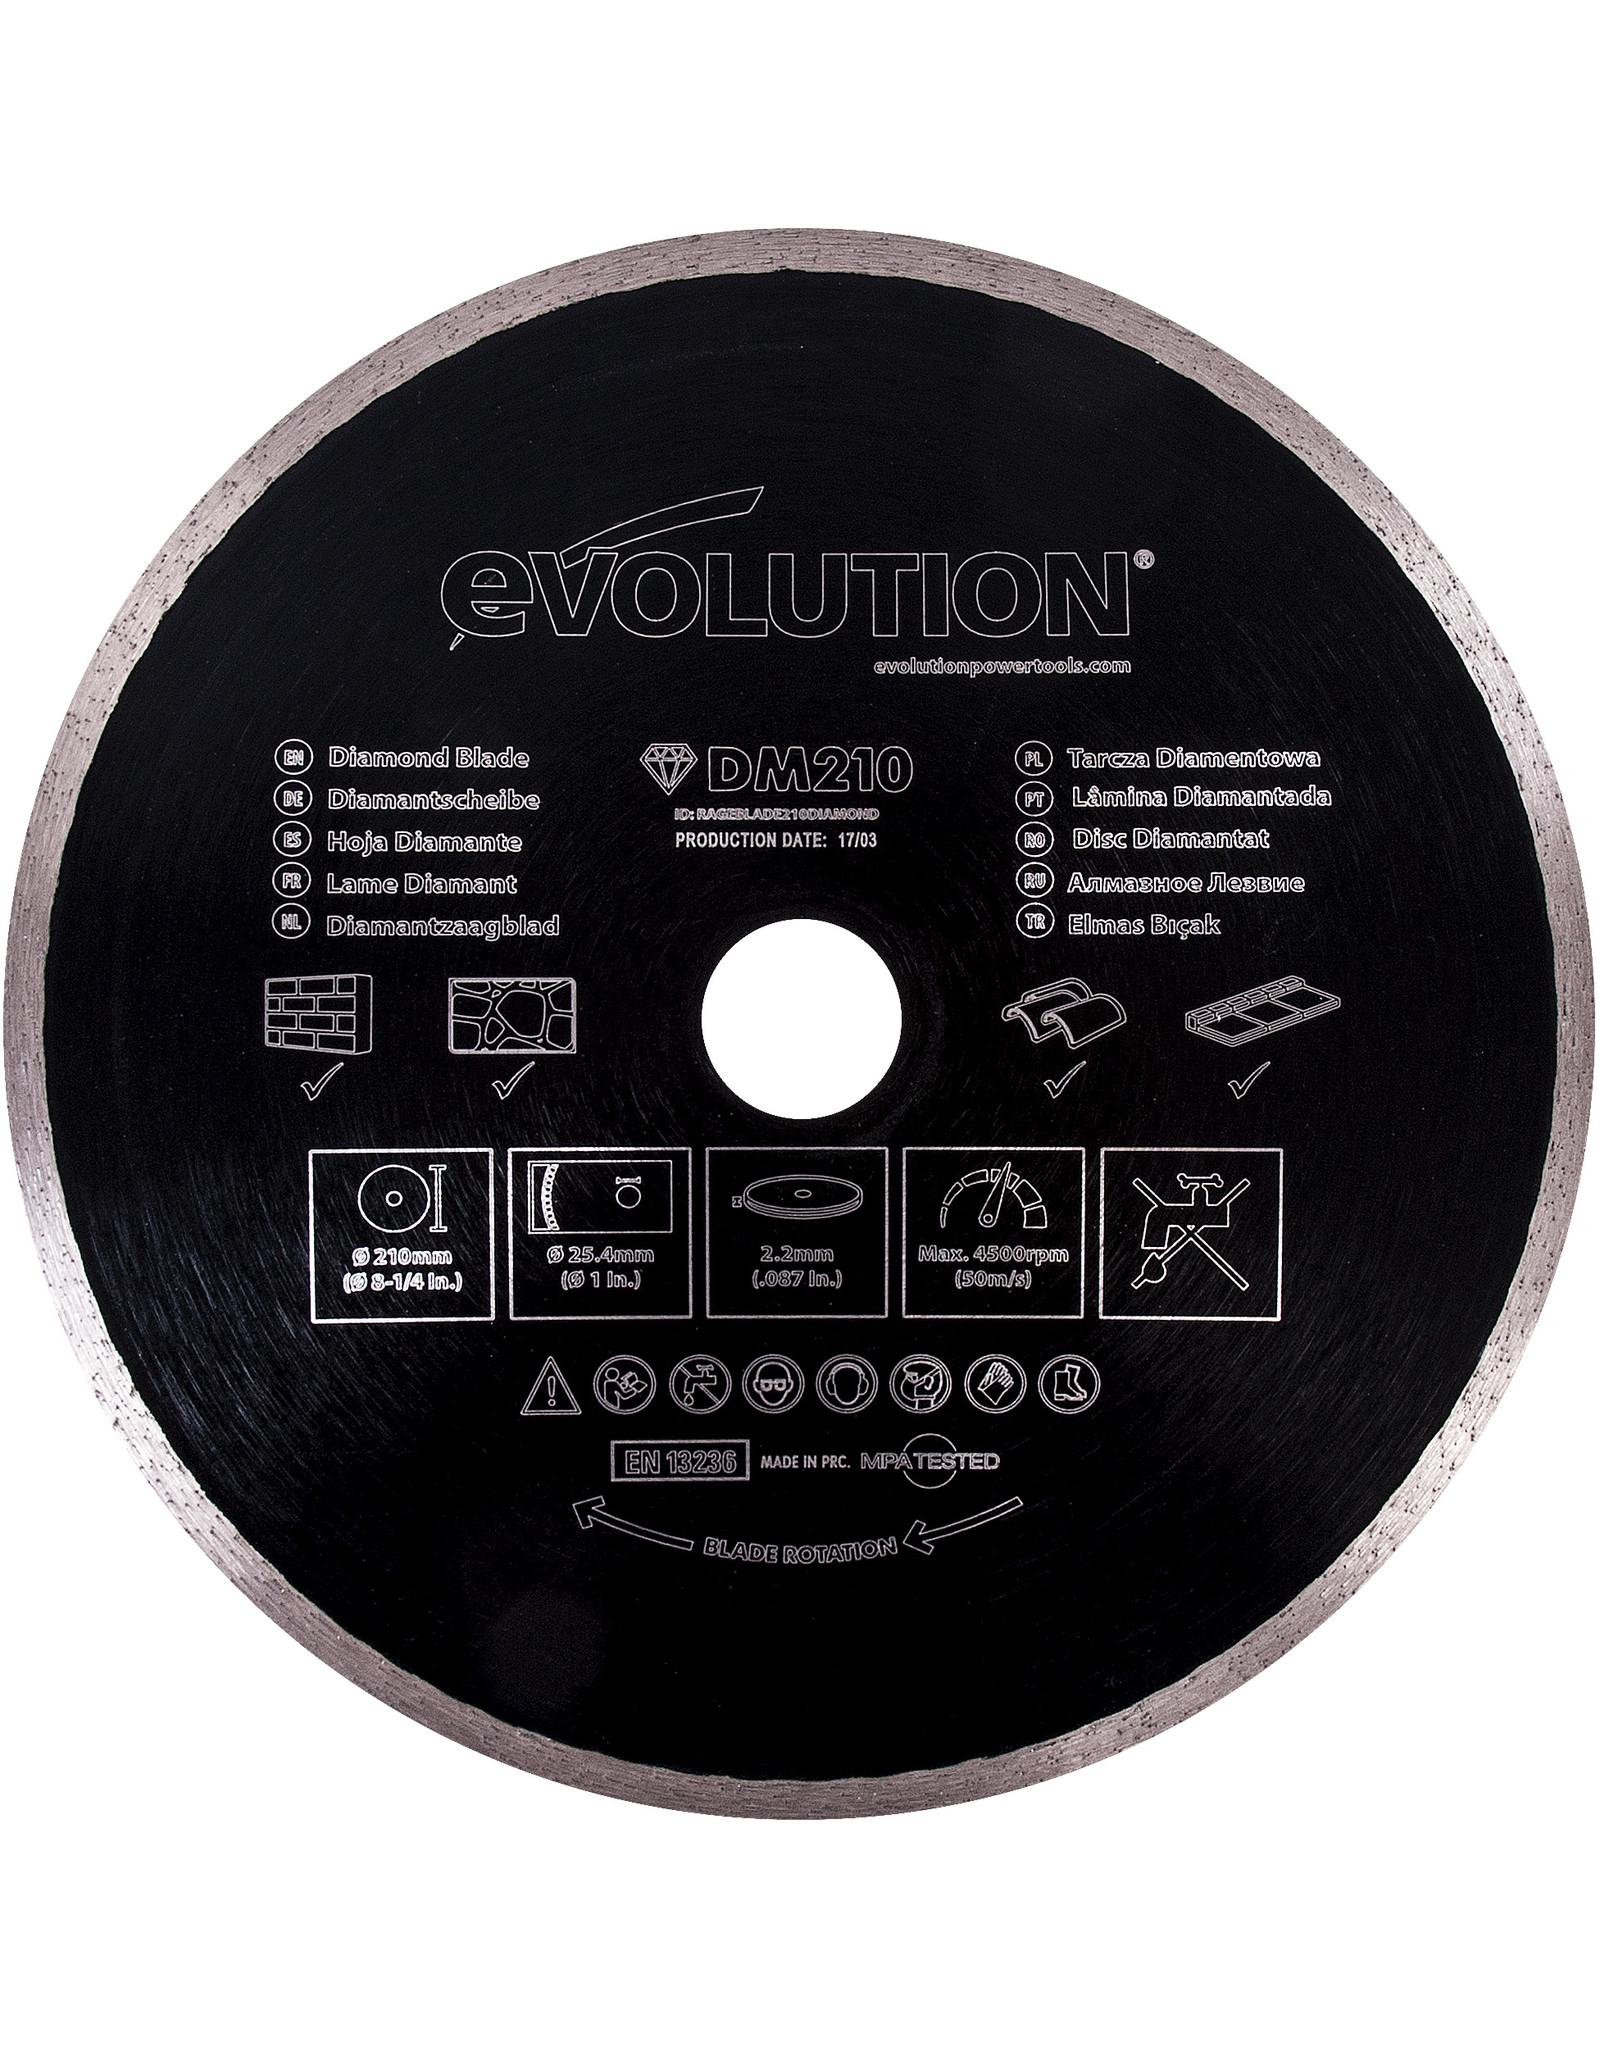 Evolution Power Tools Build Line DIAMANTKLINGE RAGE 210 MM